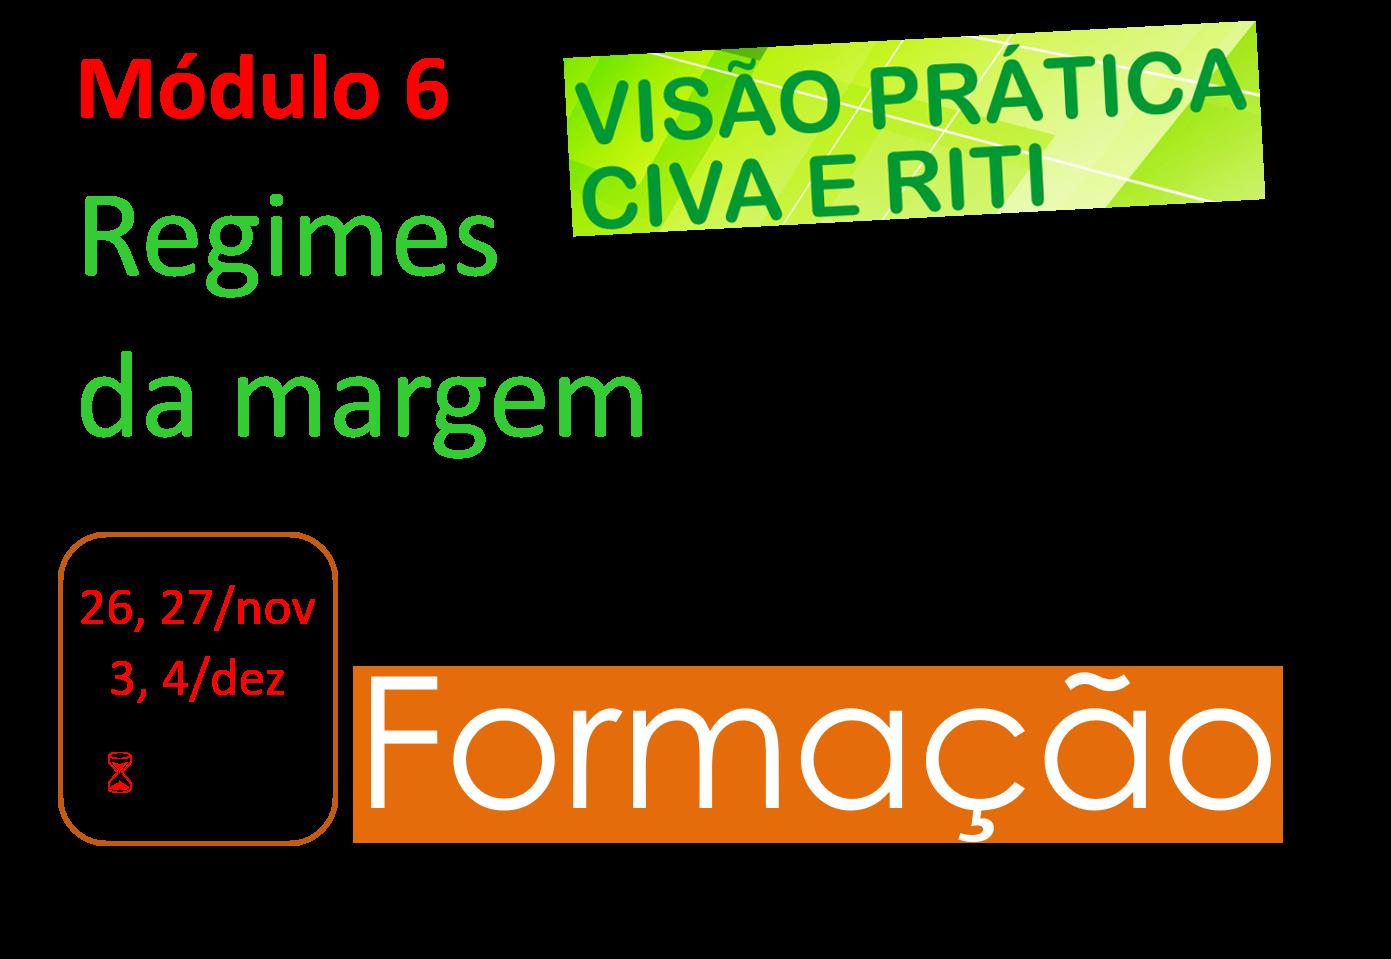 CIVA & RITI |  Módulo 6 – Regimes da margem